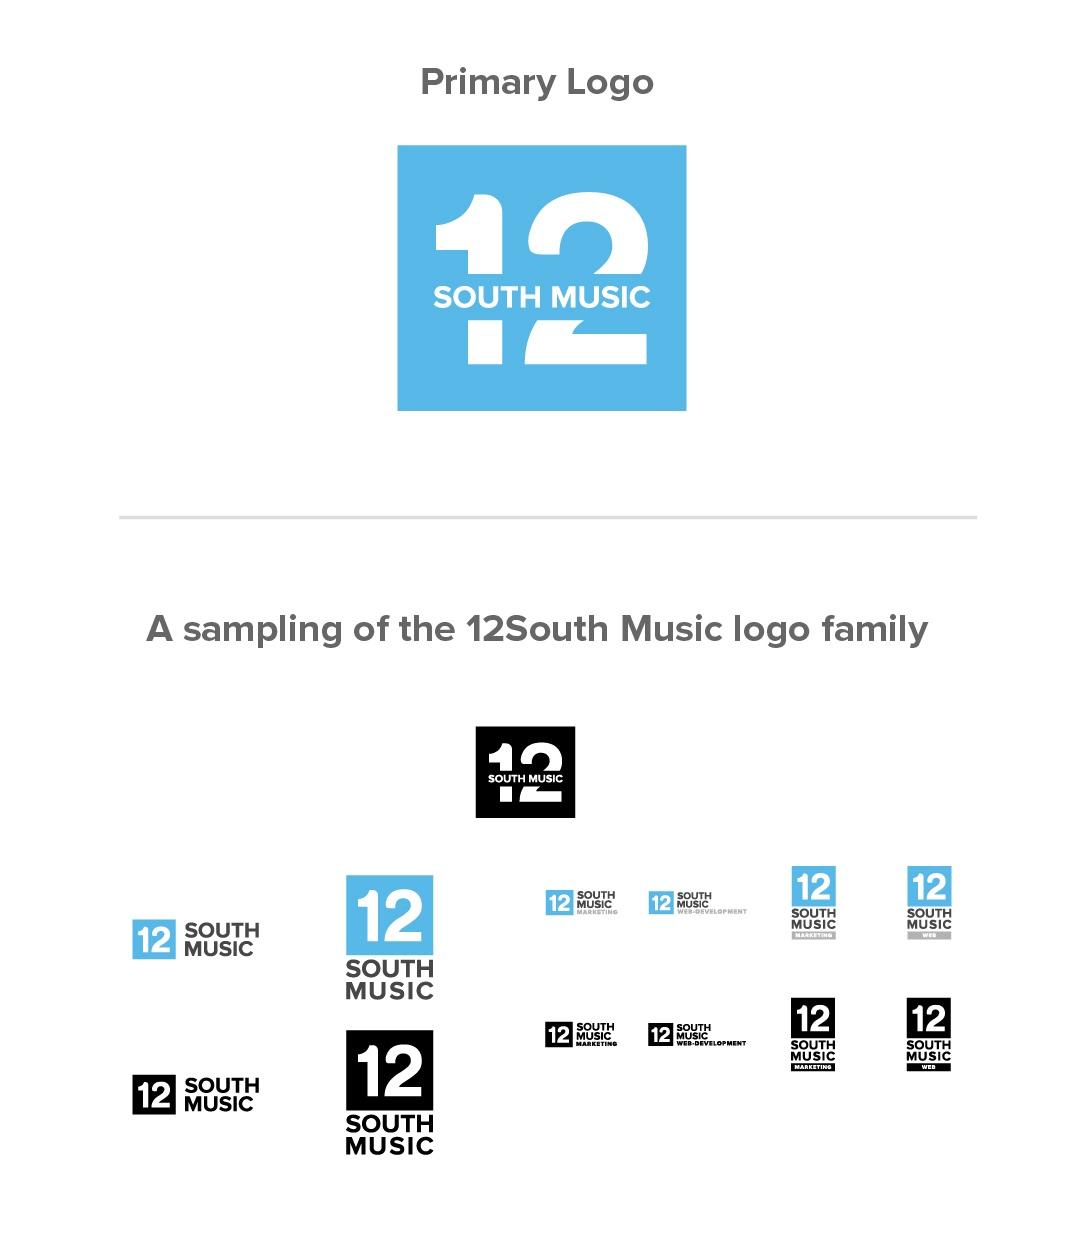 branding-12sm-logo-blog-brand-awareness-inbound-marketing-logos-01.jpg